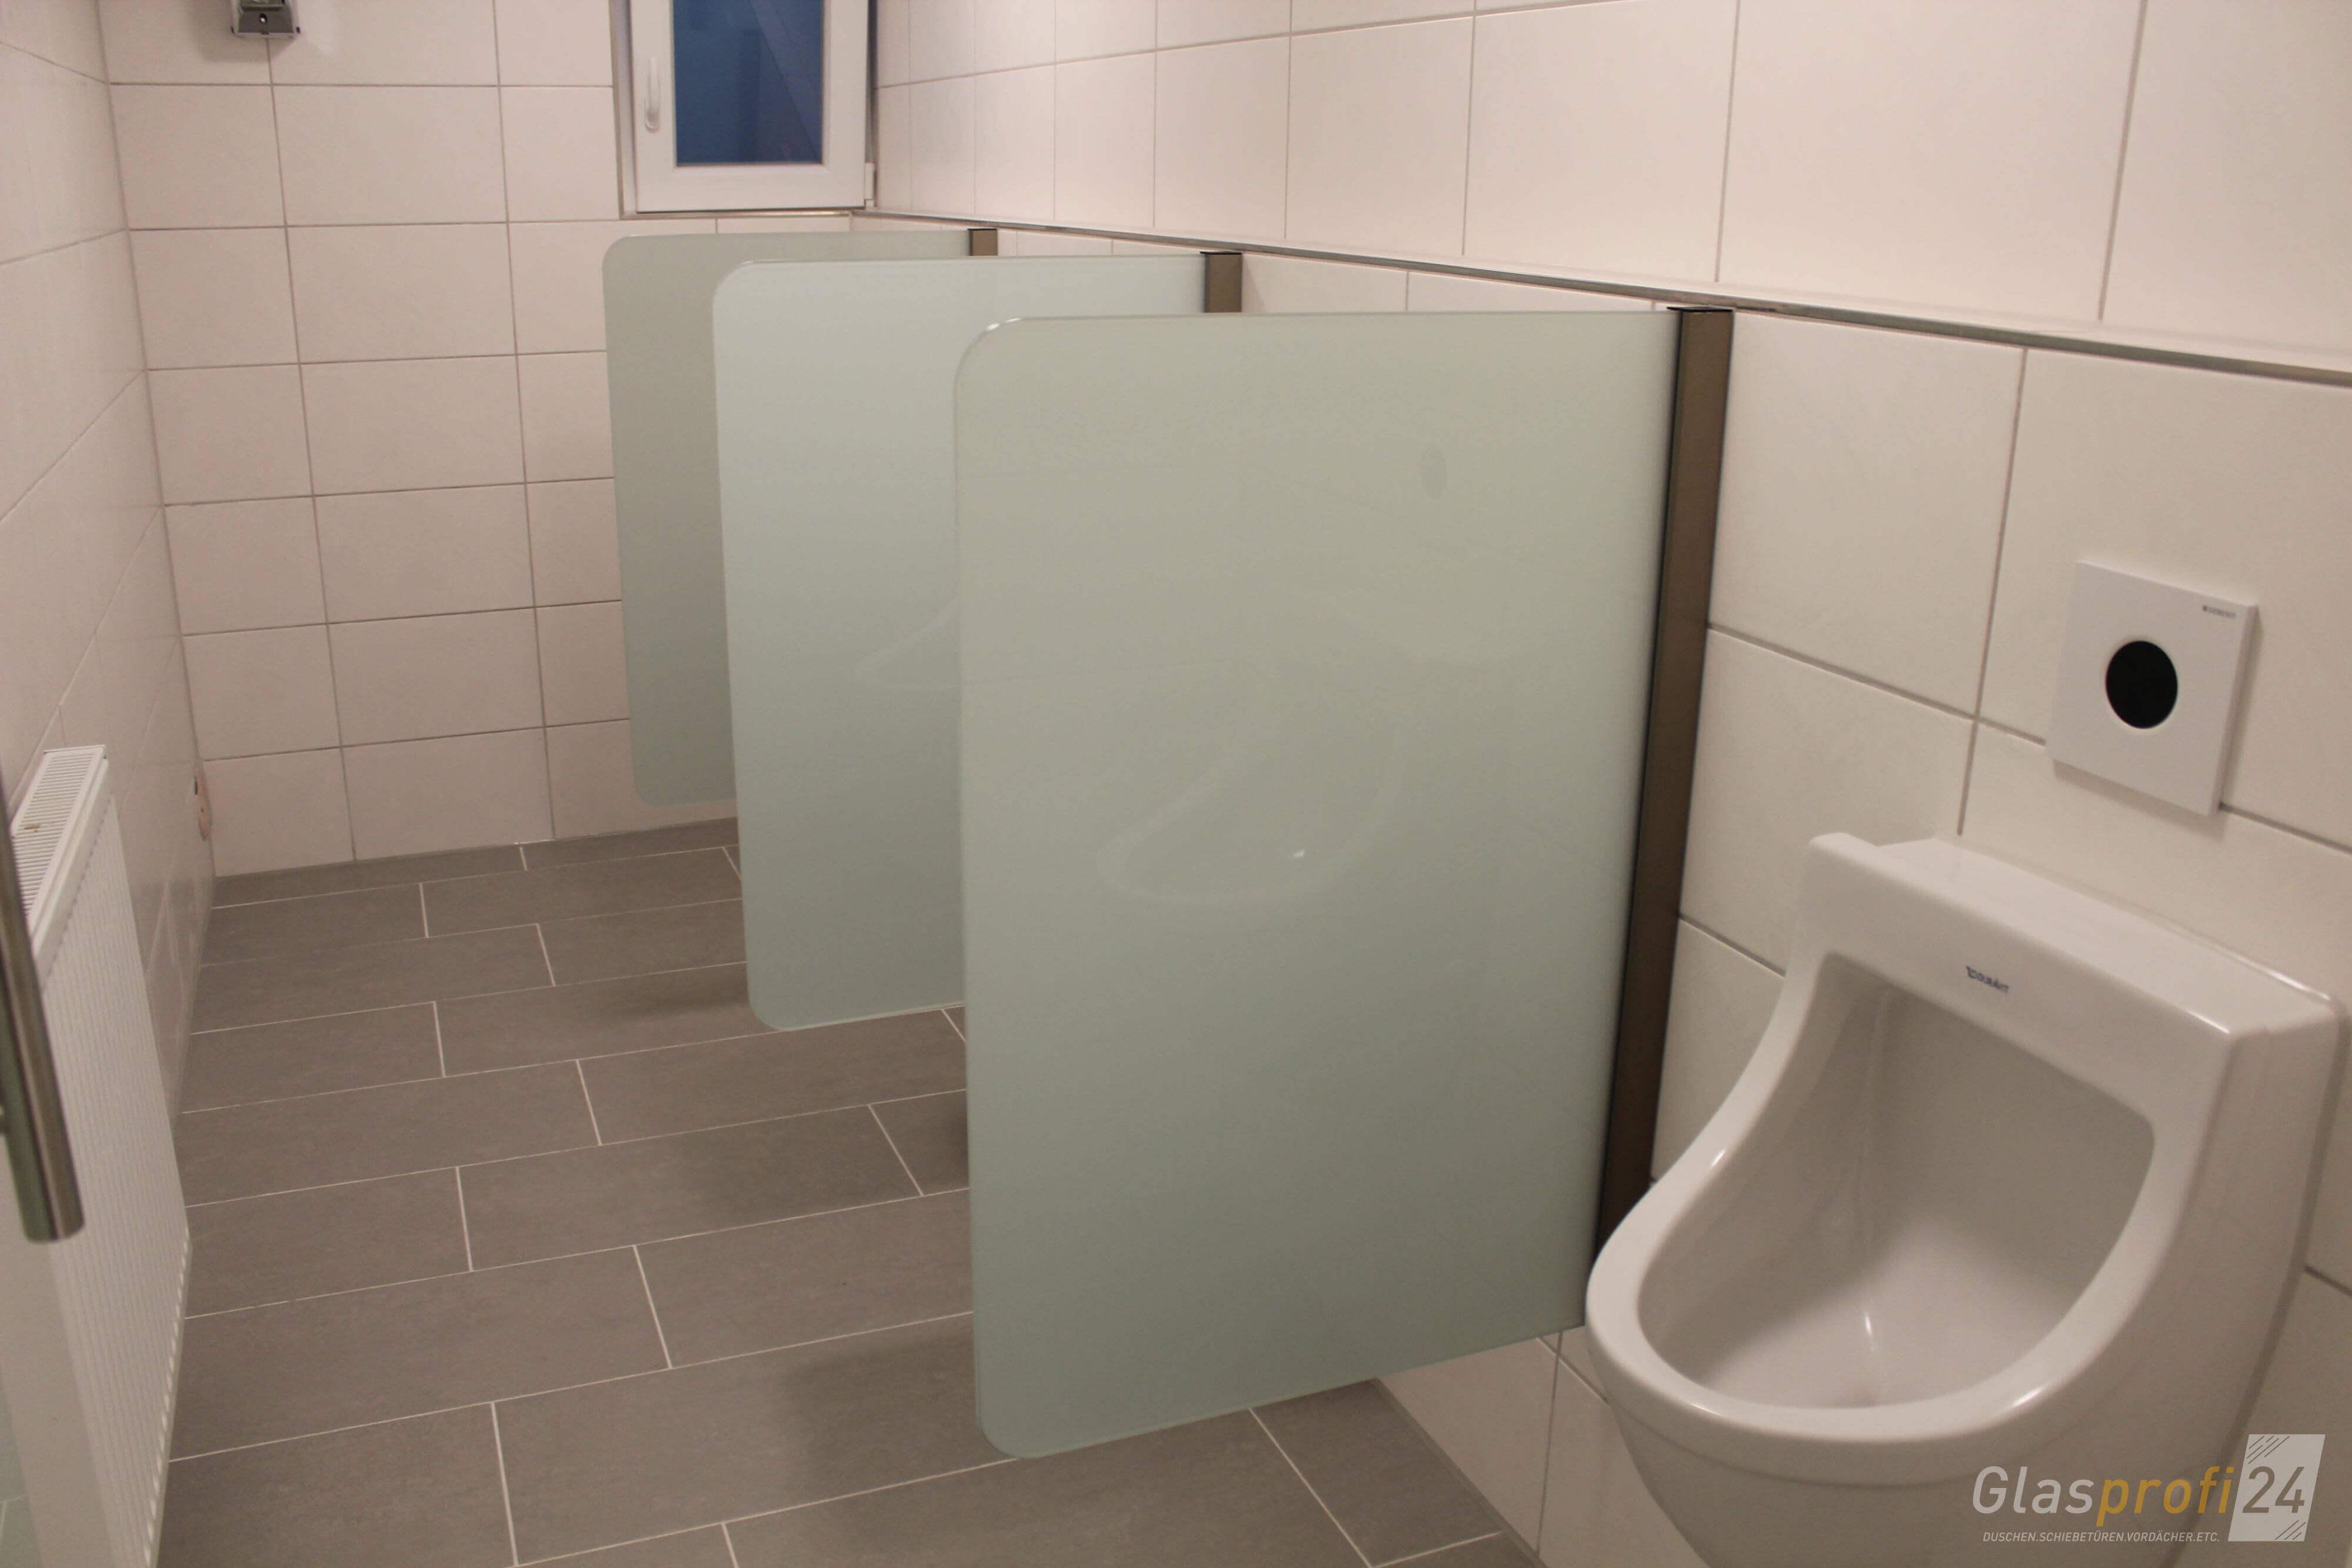 Trennwand Fur Toilette Aus Glas Glasprofi24